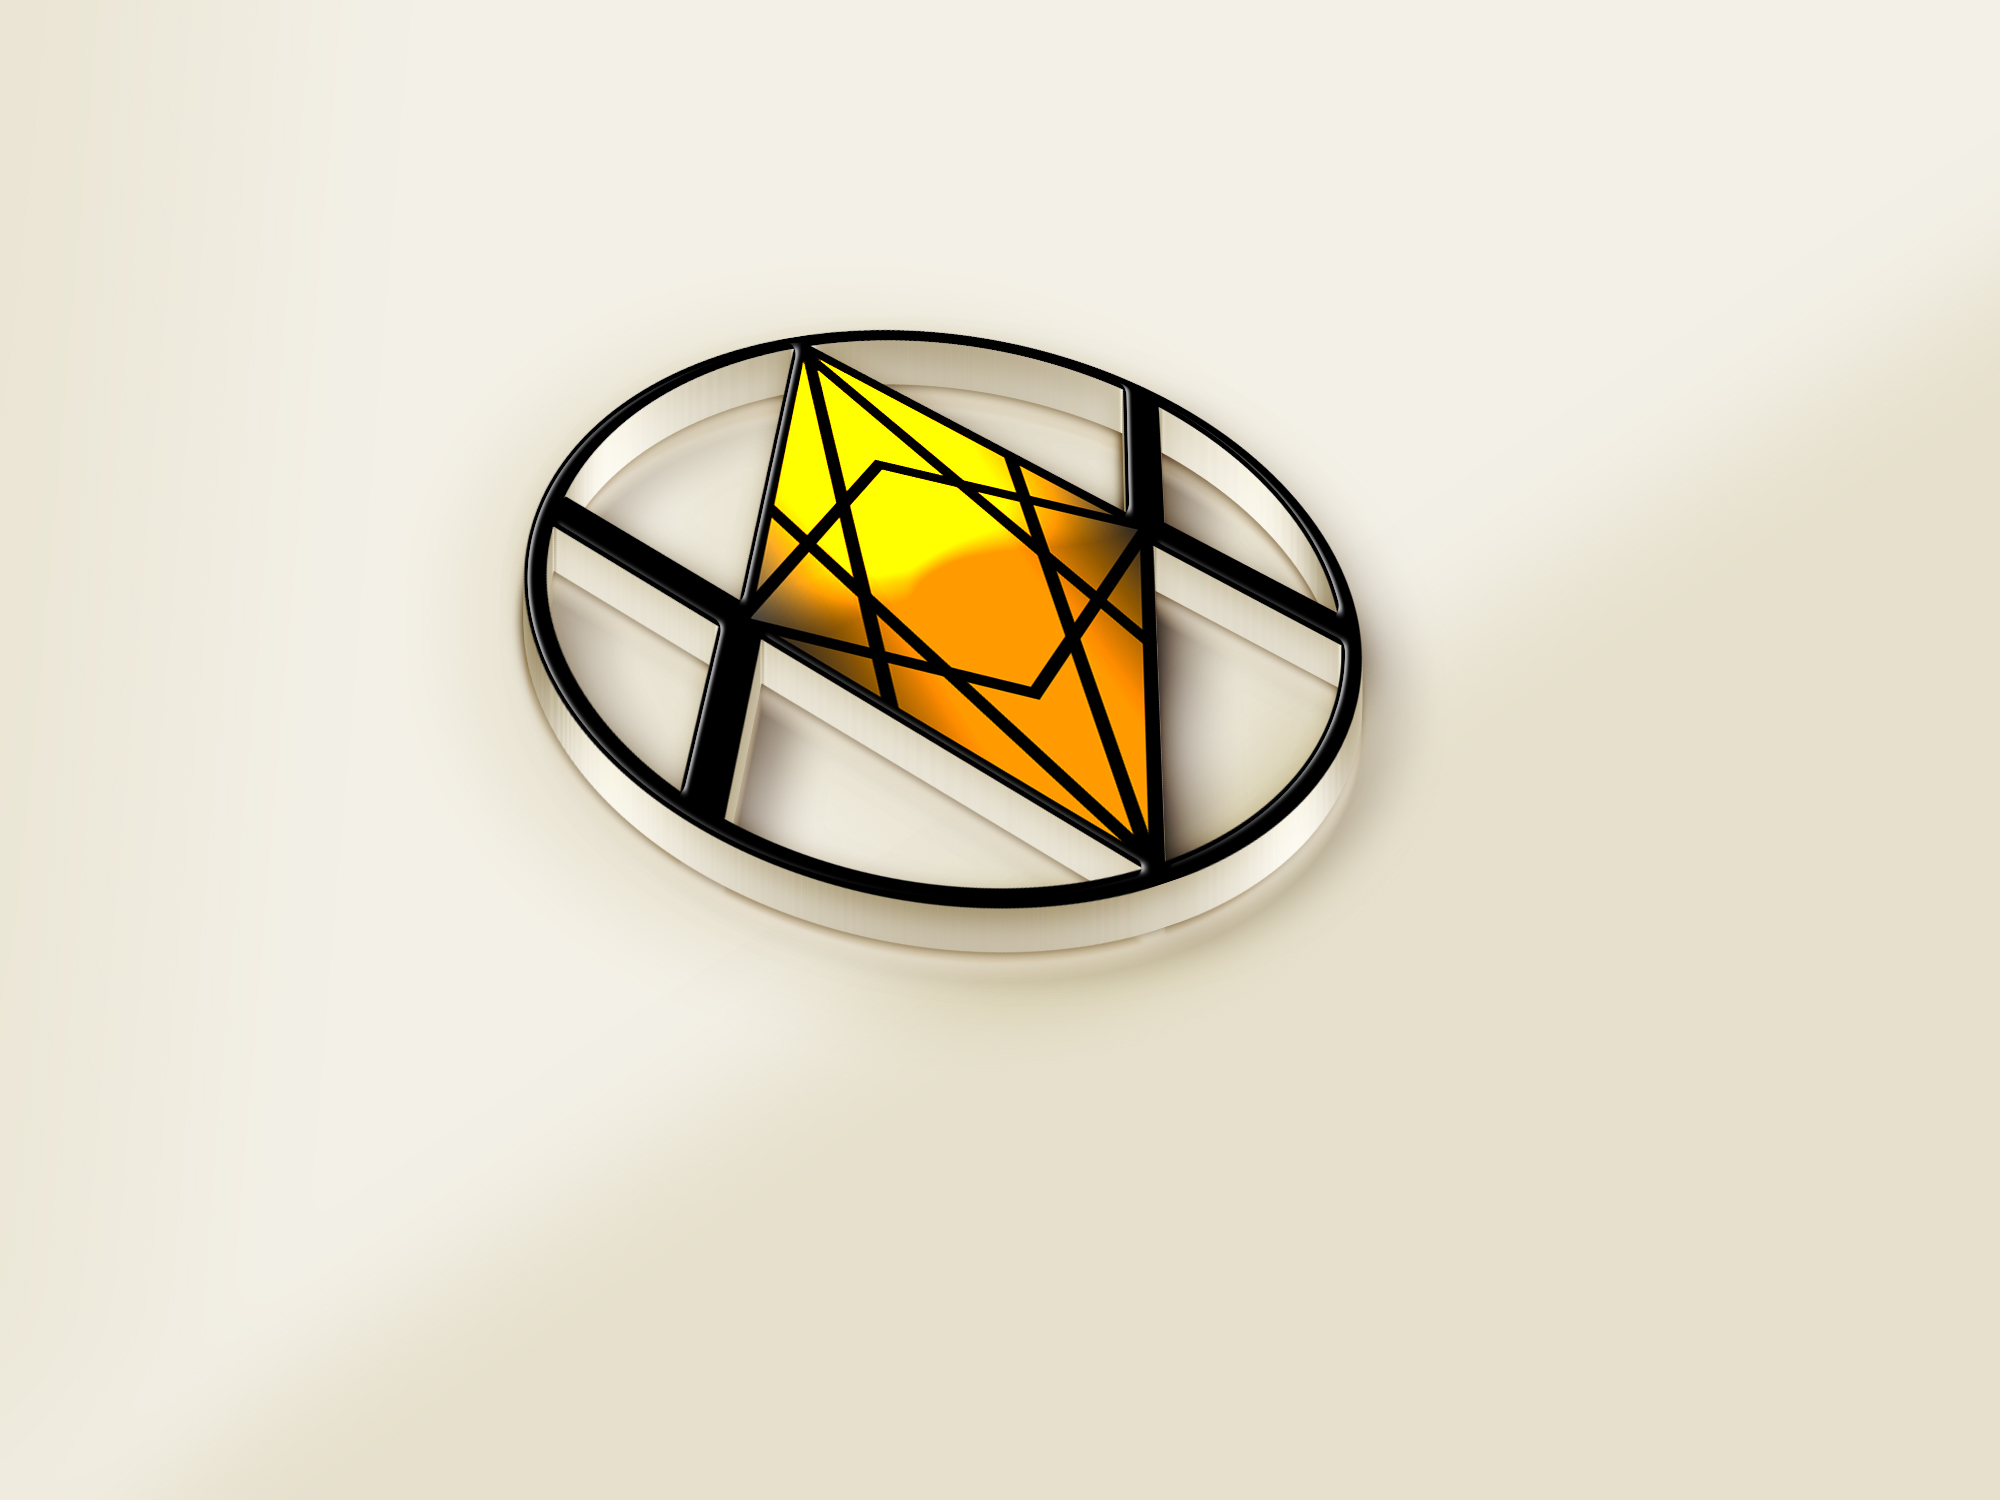 Нужен логотип (эмблема) для самодельного квадроцикла фото f_4665afe7e3d0d6b1.jpg